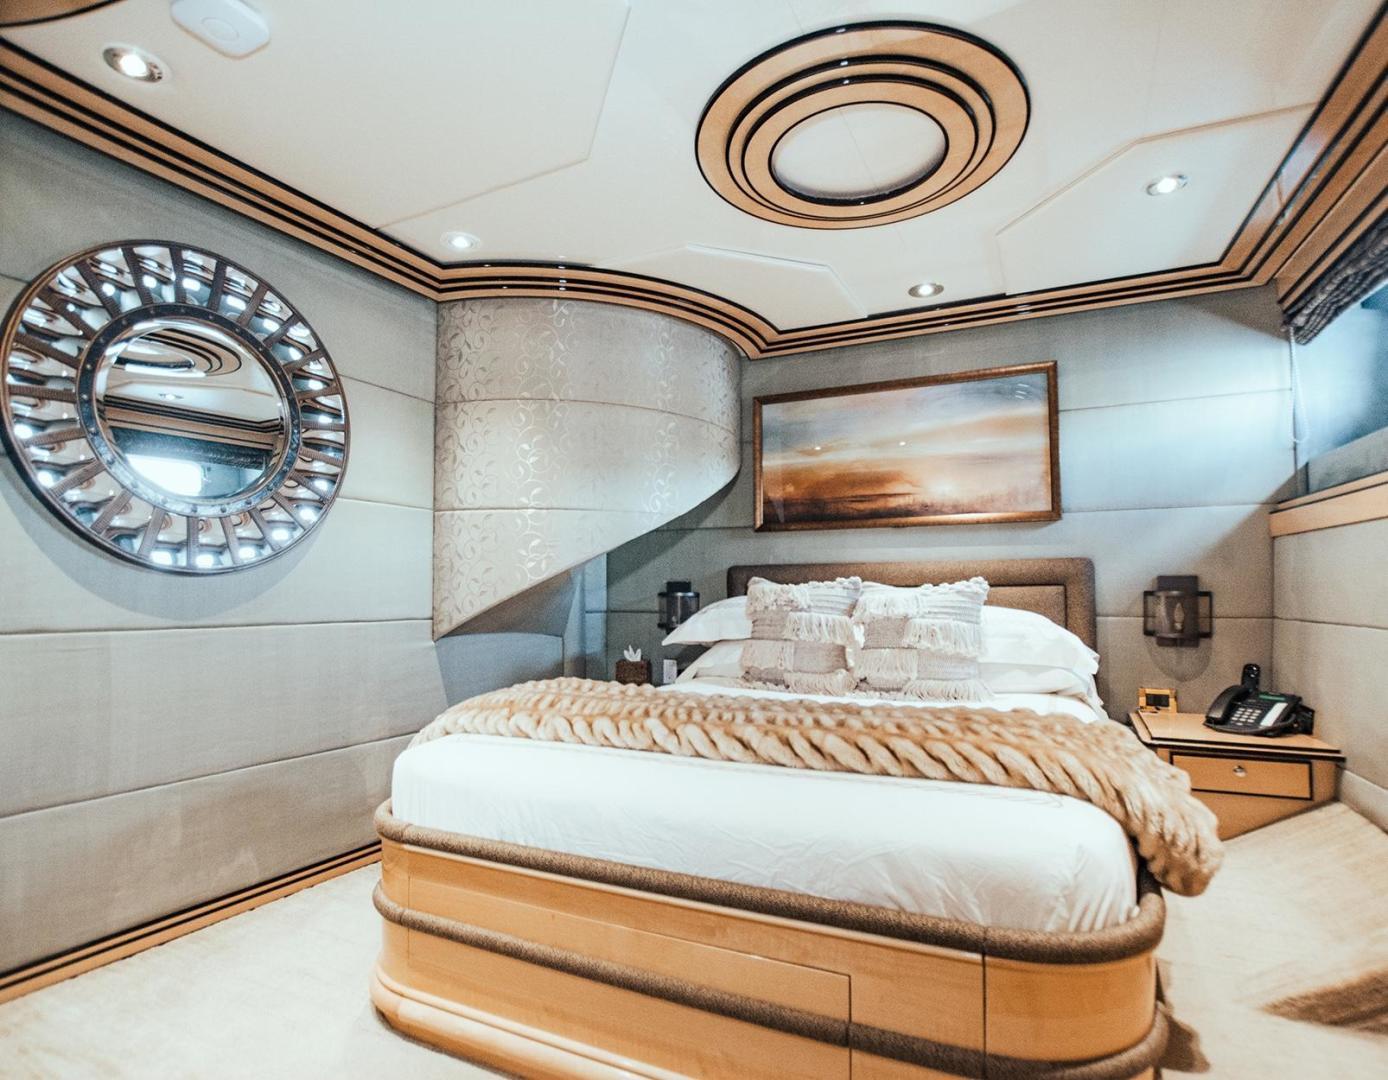 Motor Yacht-Norship 1994-Impulsive Fort Lauderdale-Florida-United States-1562589 | Thumbnail